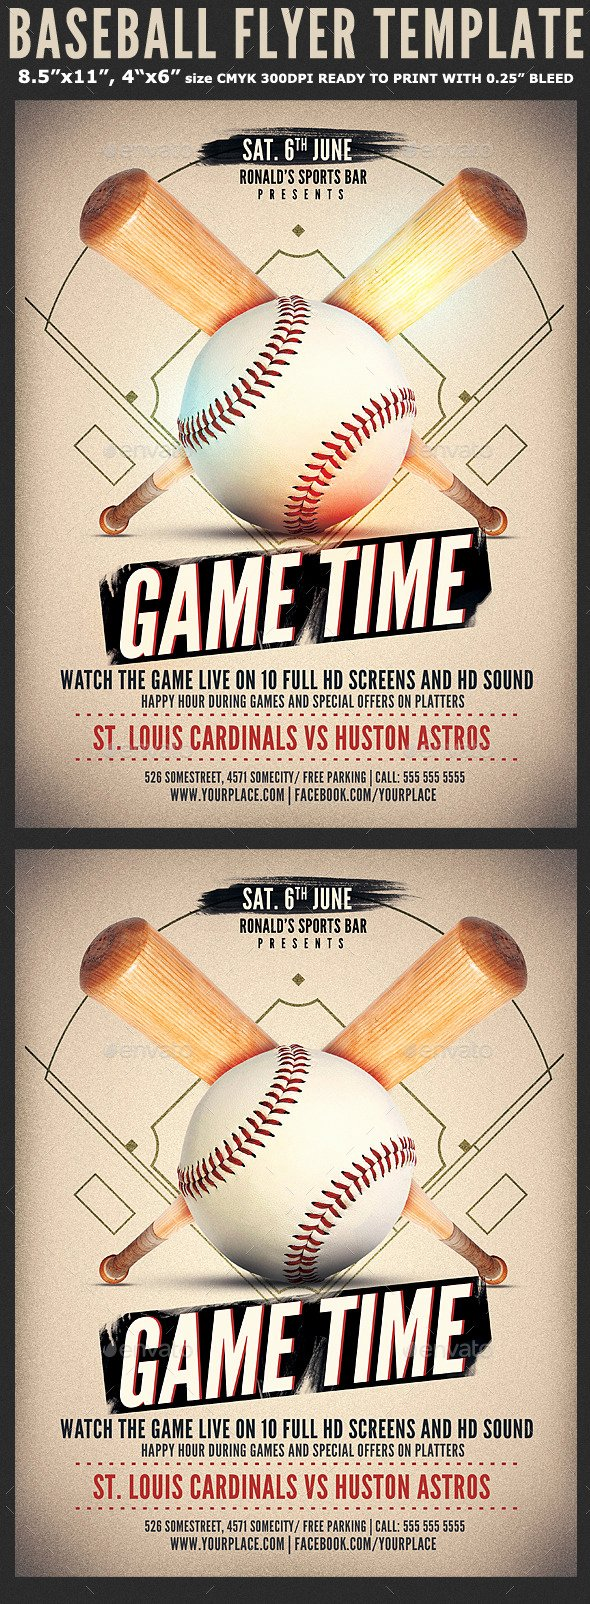 Fundraiser Flyer Template Free New Baseball Fundraiser Flyer Template Yourweek Eca25e